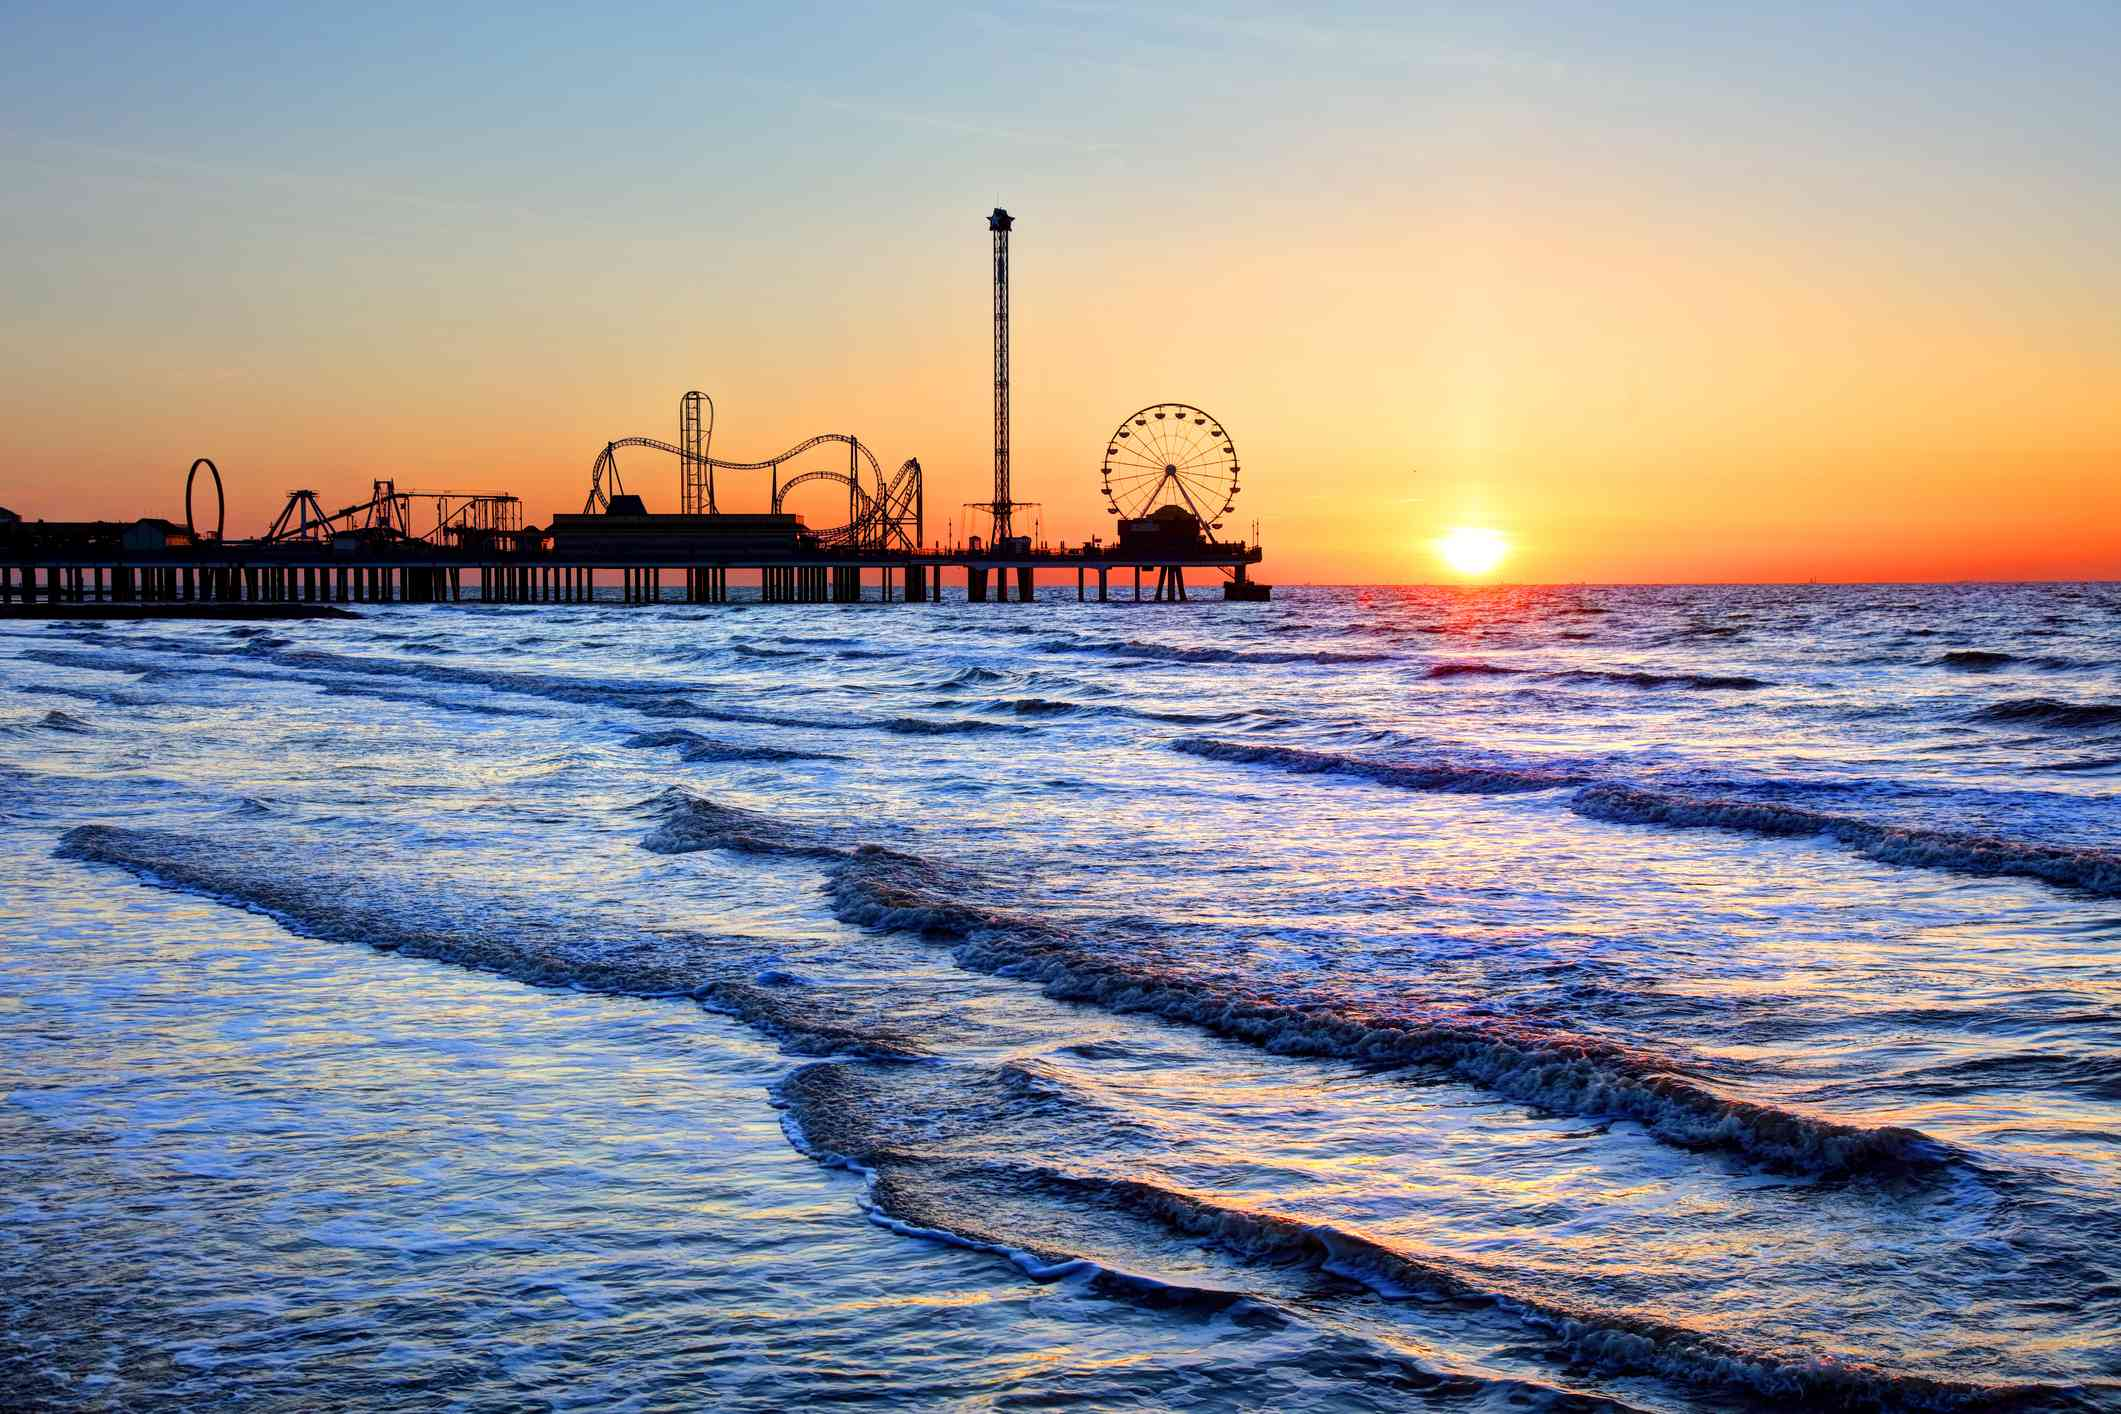 Galveston Island Historic Pleasure Pier in silhouette at sunset